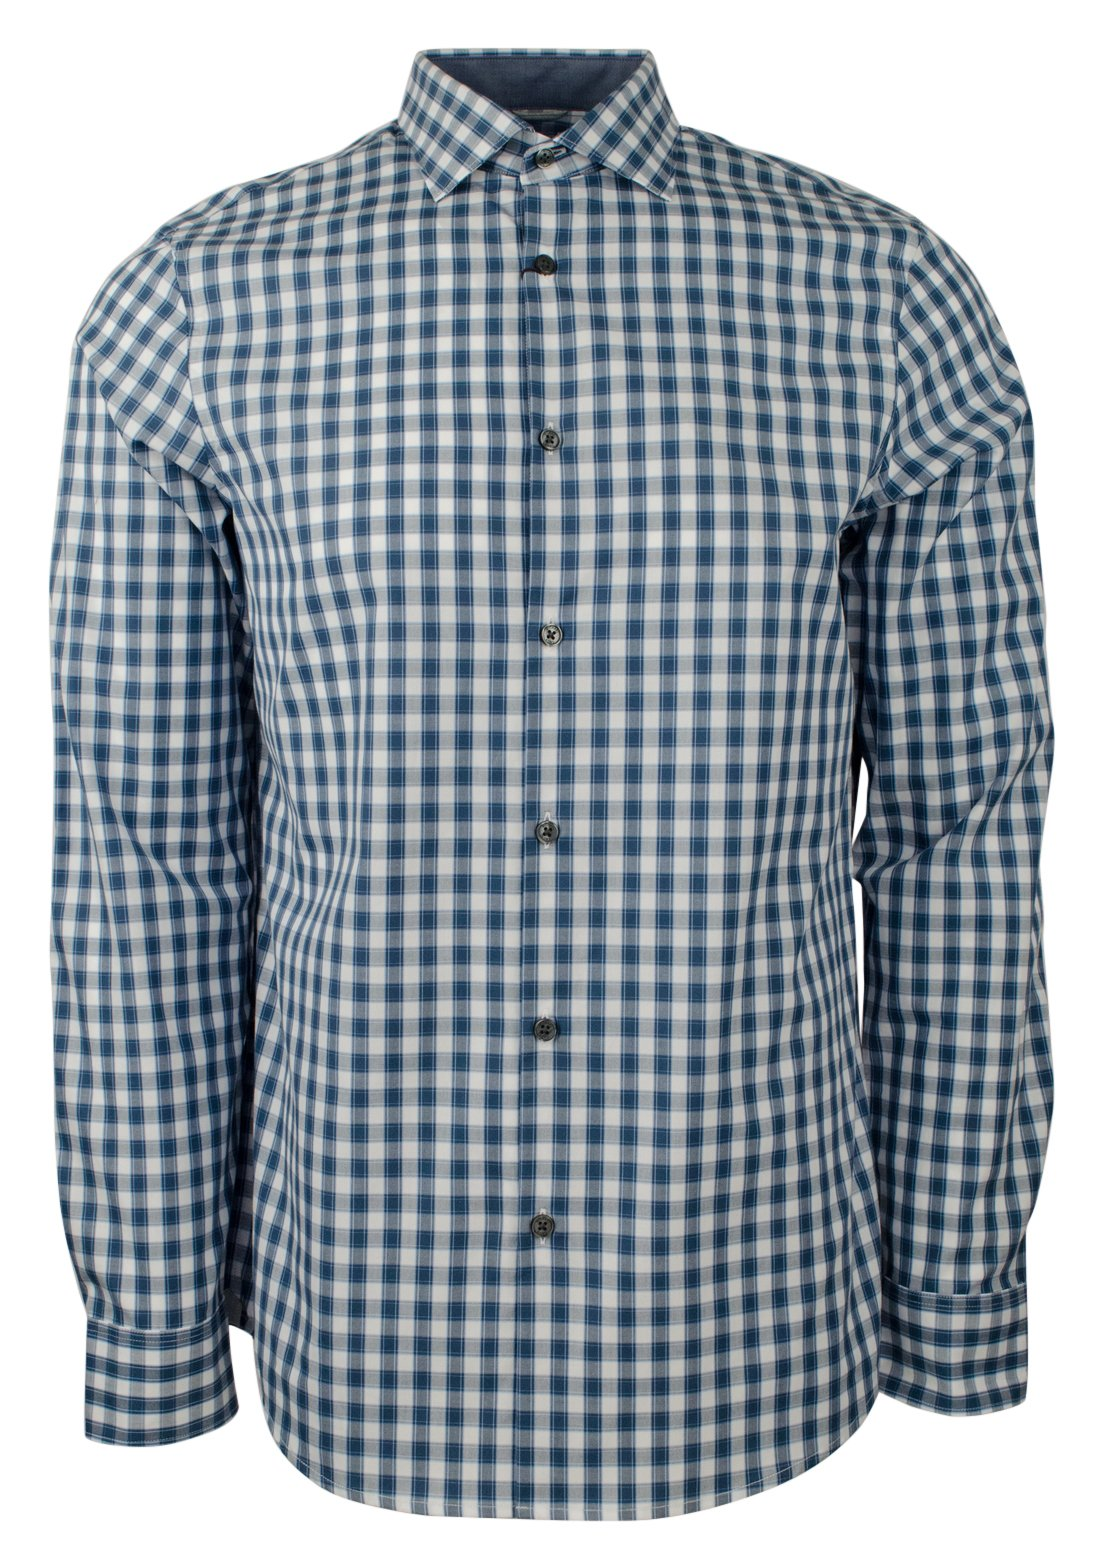 Michael Kors Men's Long Sleeve Plaid Striped Cotton Tailored Fit Shirt-PB-M